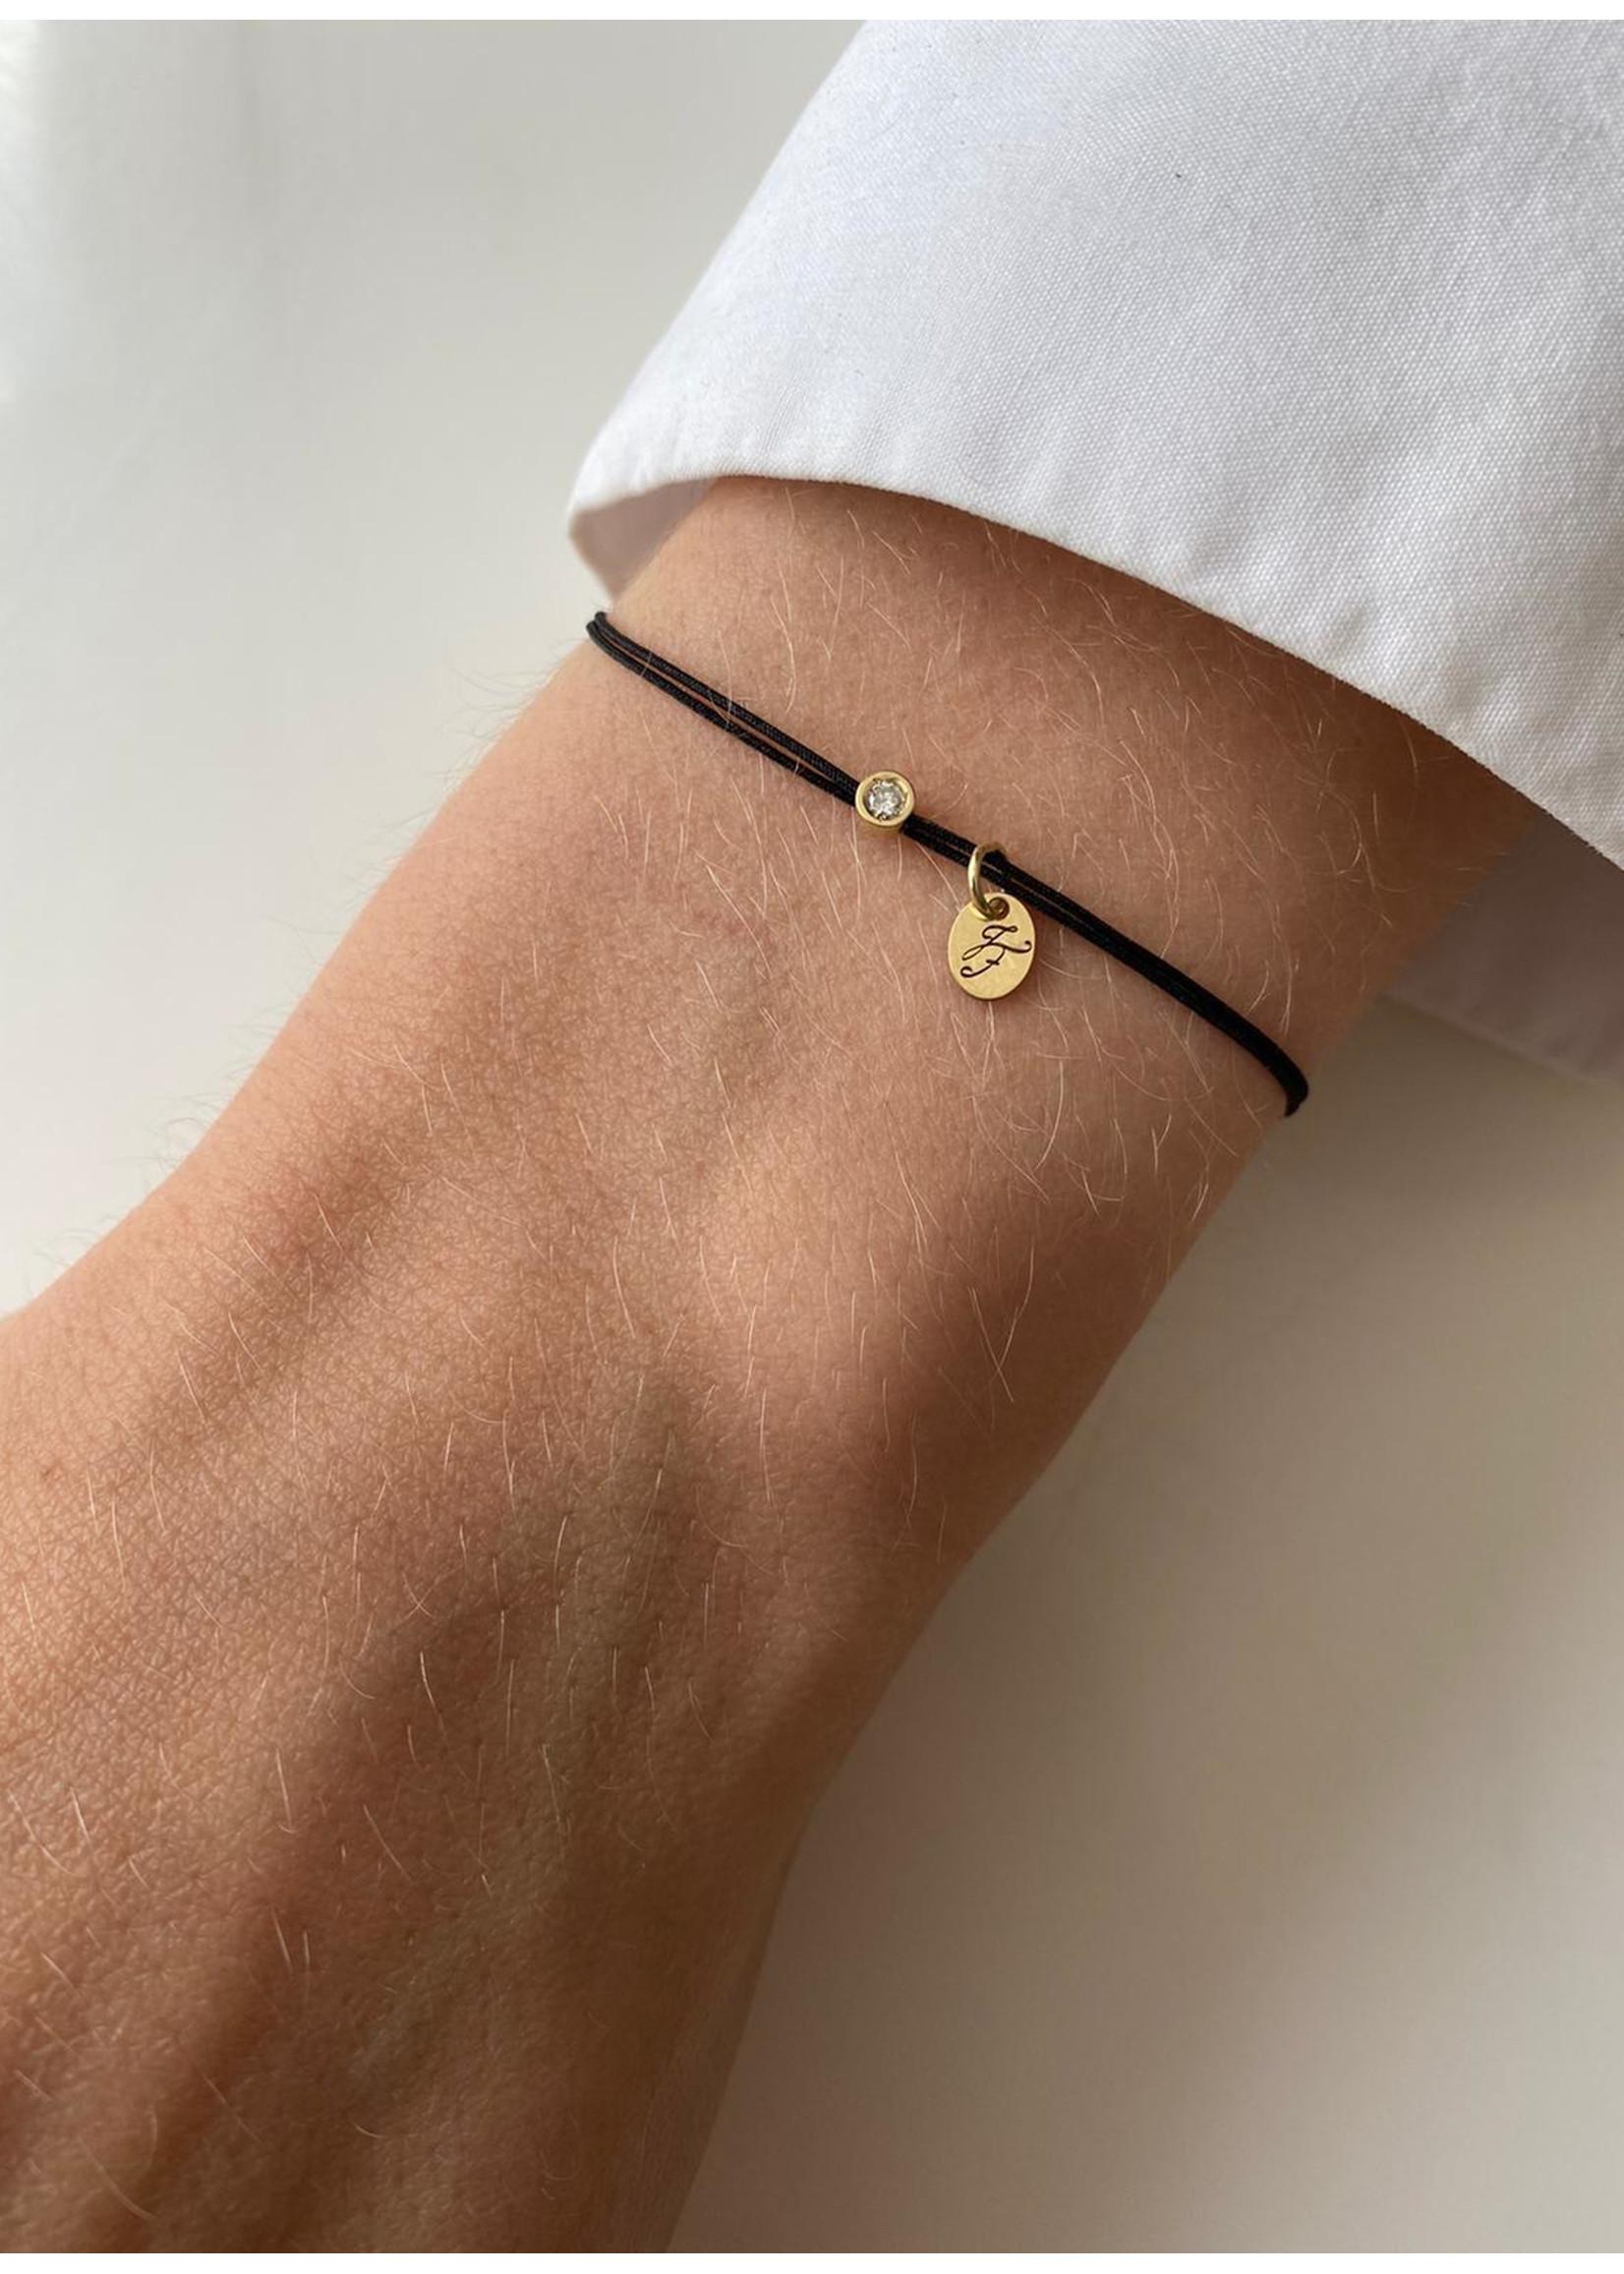 Just Franky Capital diamond bracelet 0,03 crt